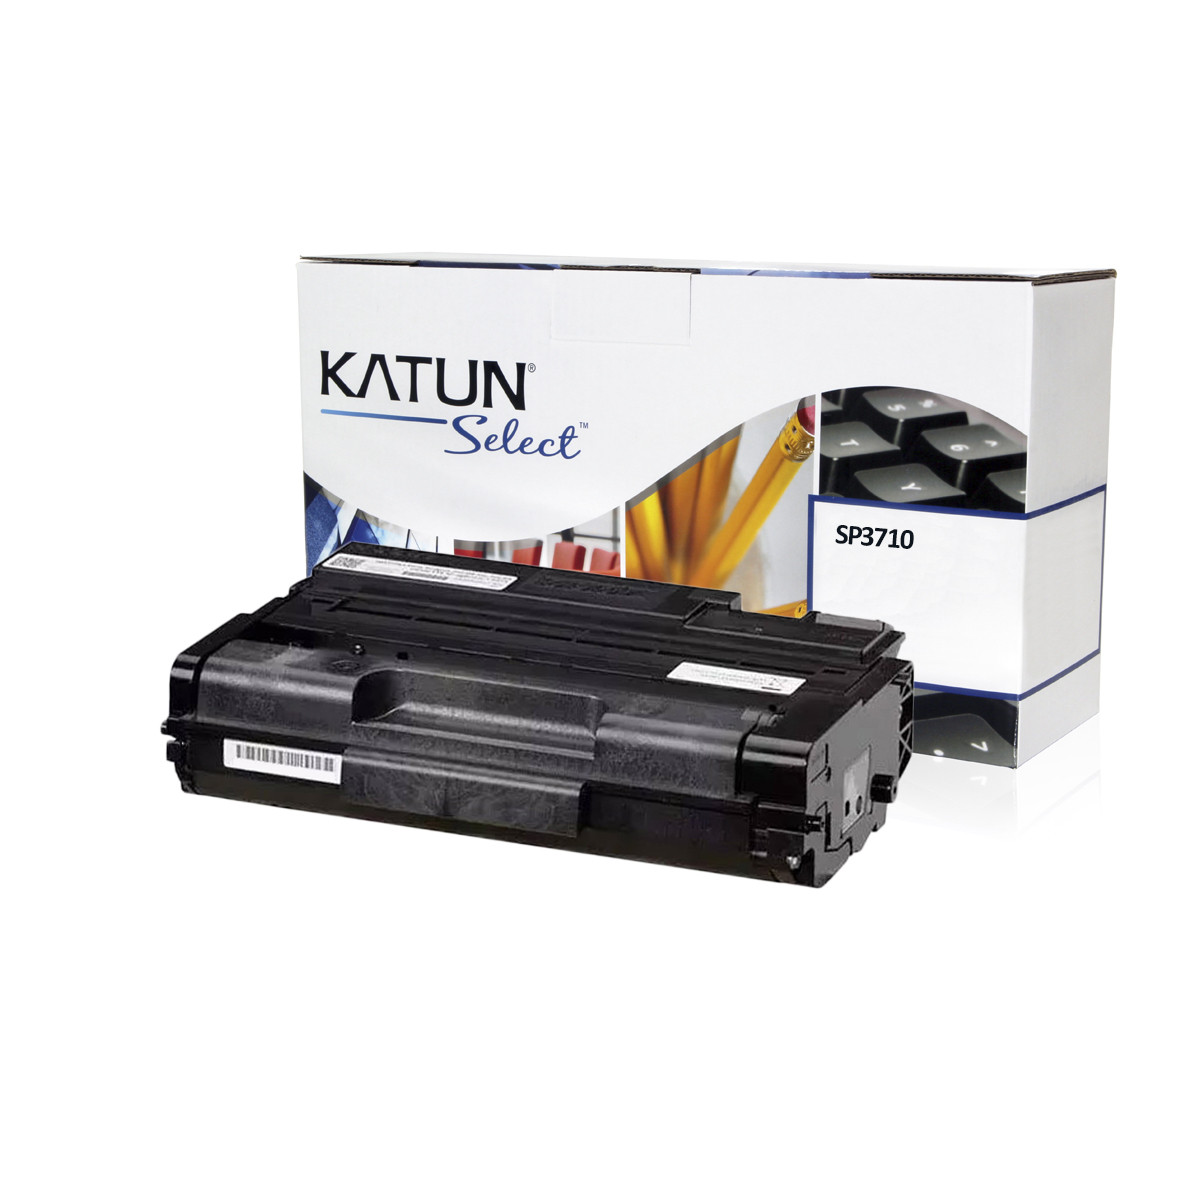 Toner Compatível com Ricoh SP3710 SP3710SF SP3710DN 40828 | Katun Select 7k